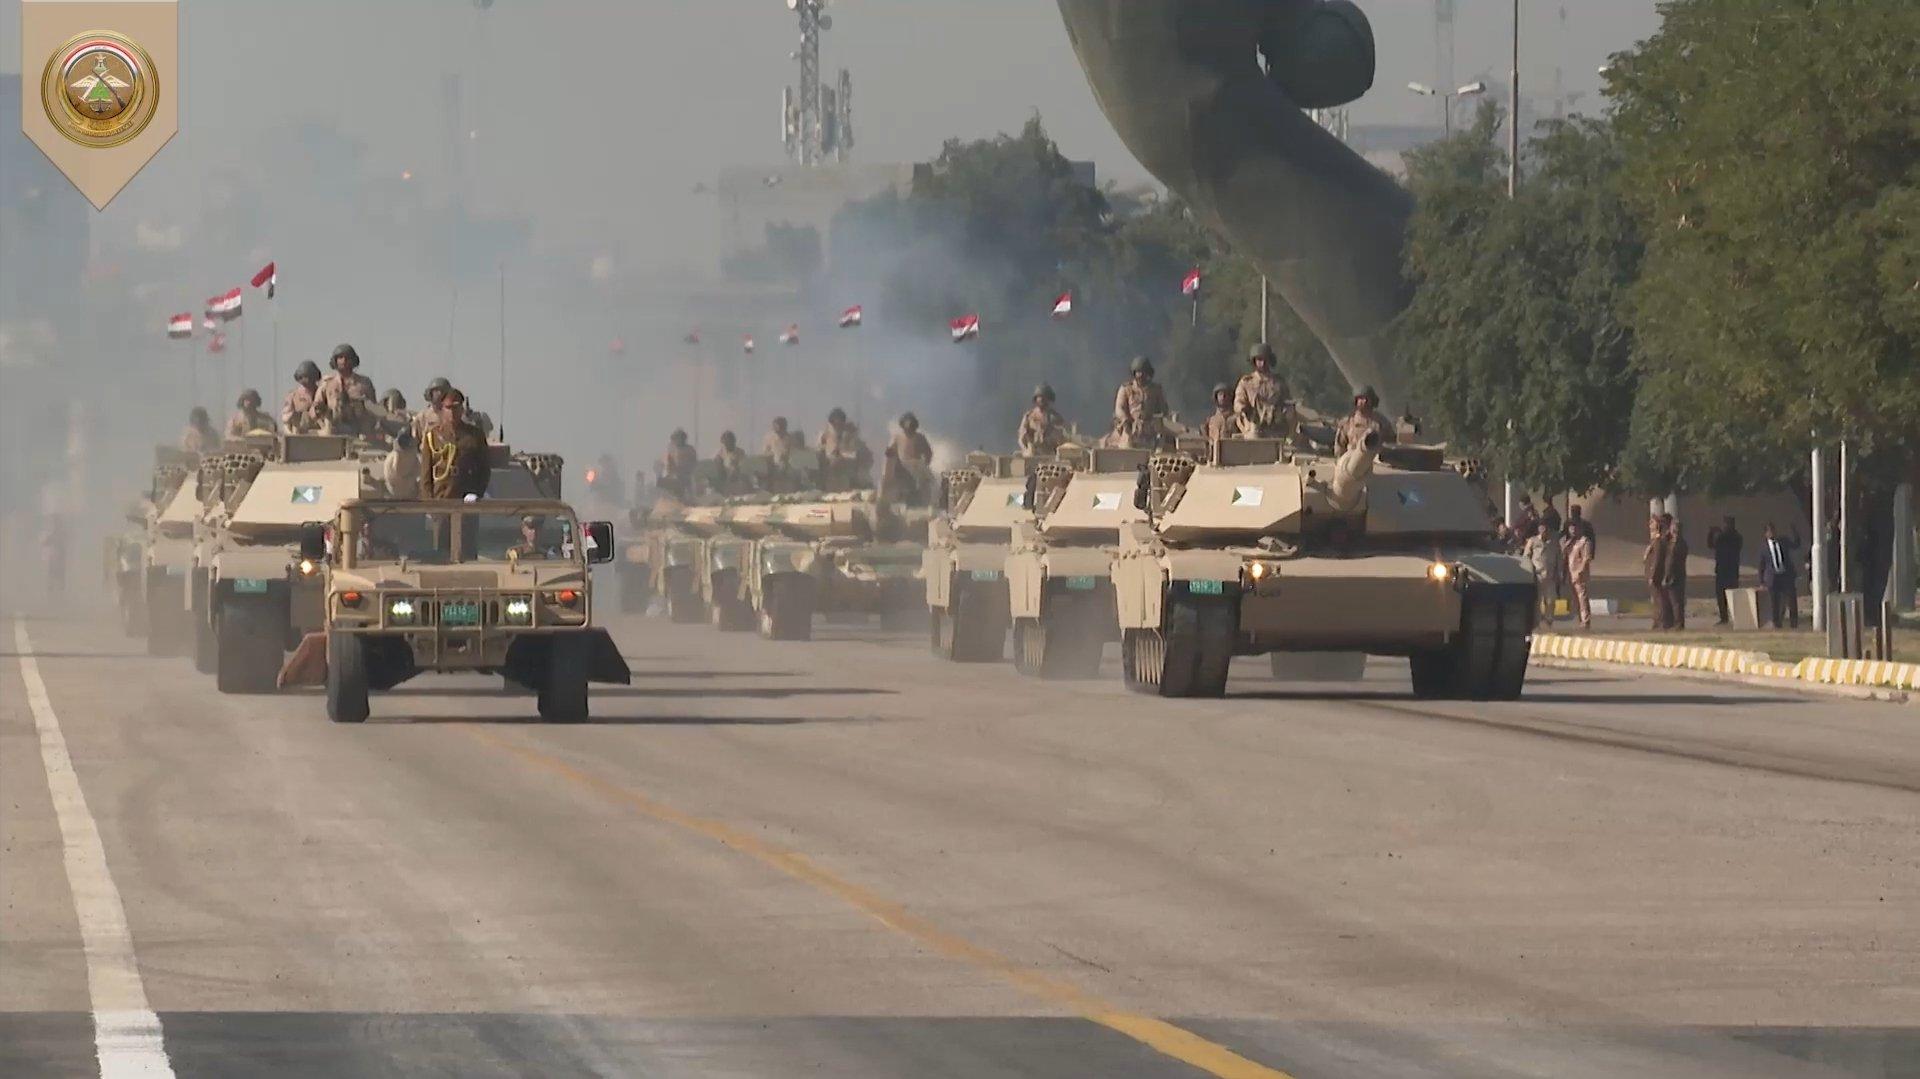 Armée Irakienne / Iraqi Armed Forces - Page 38 ErHtLf2XMAEXK5G?format=jpg&name=large